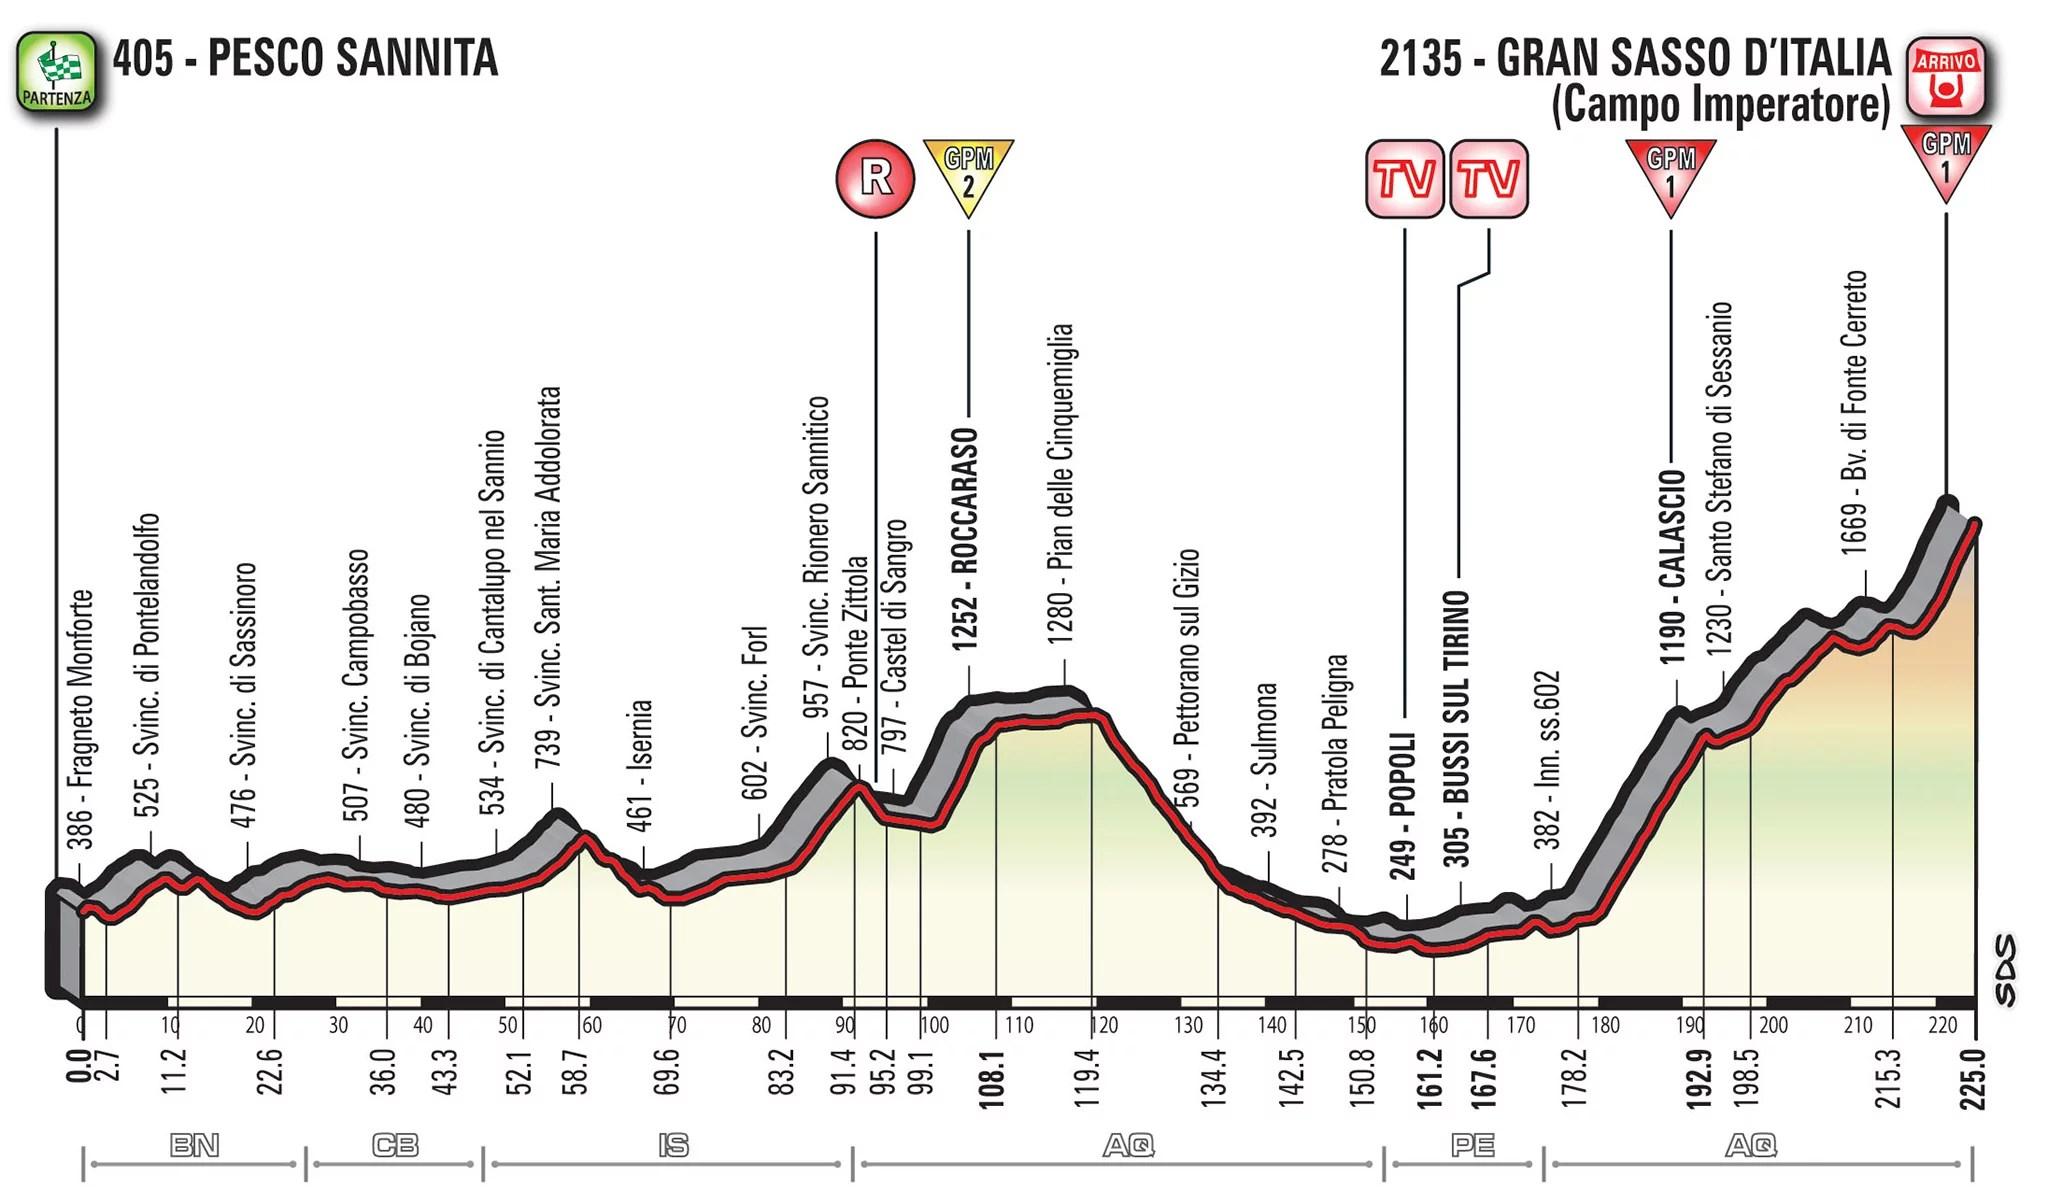 Les derniers kilomètres de la 9e étape en vidéo — Giro